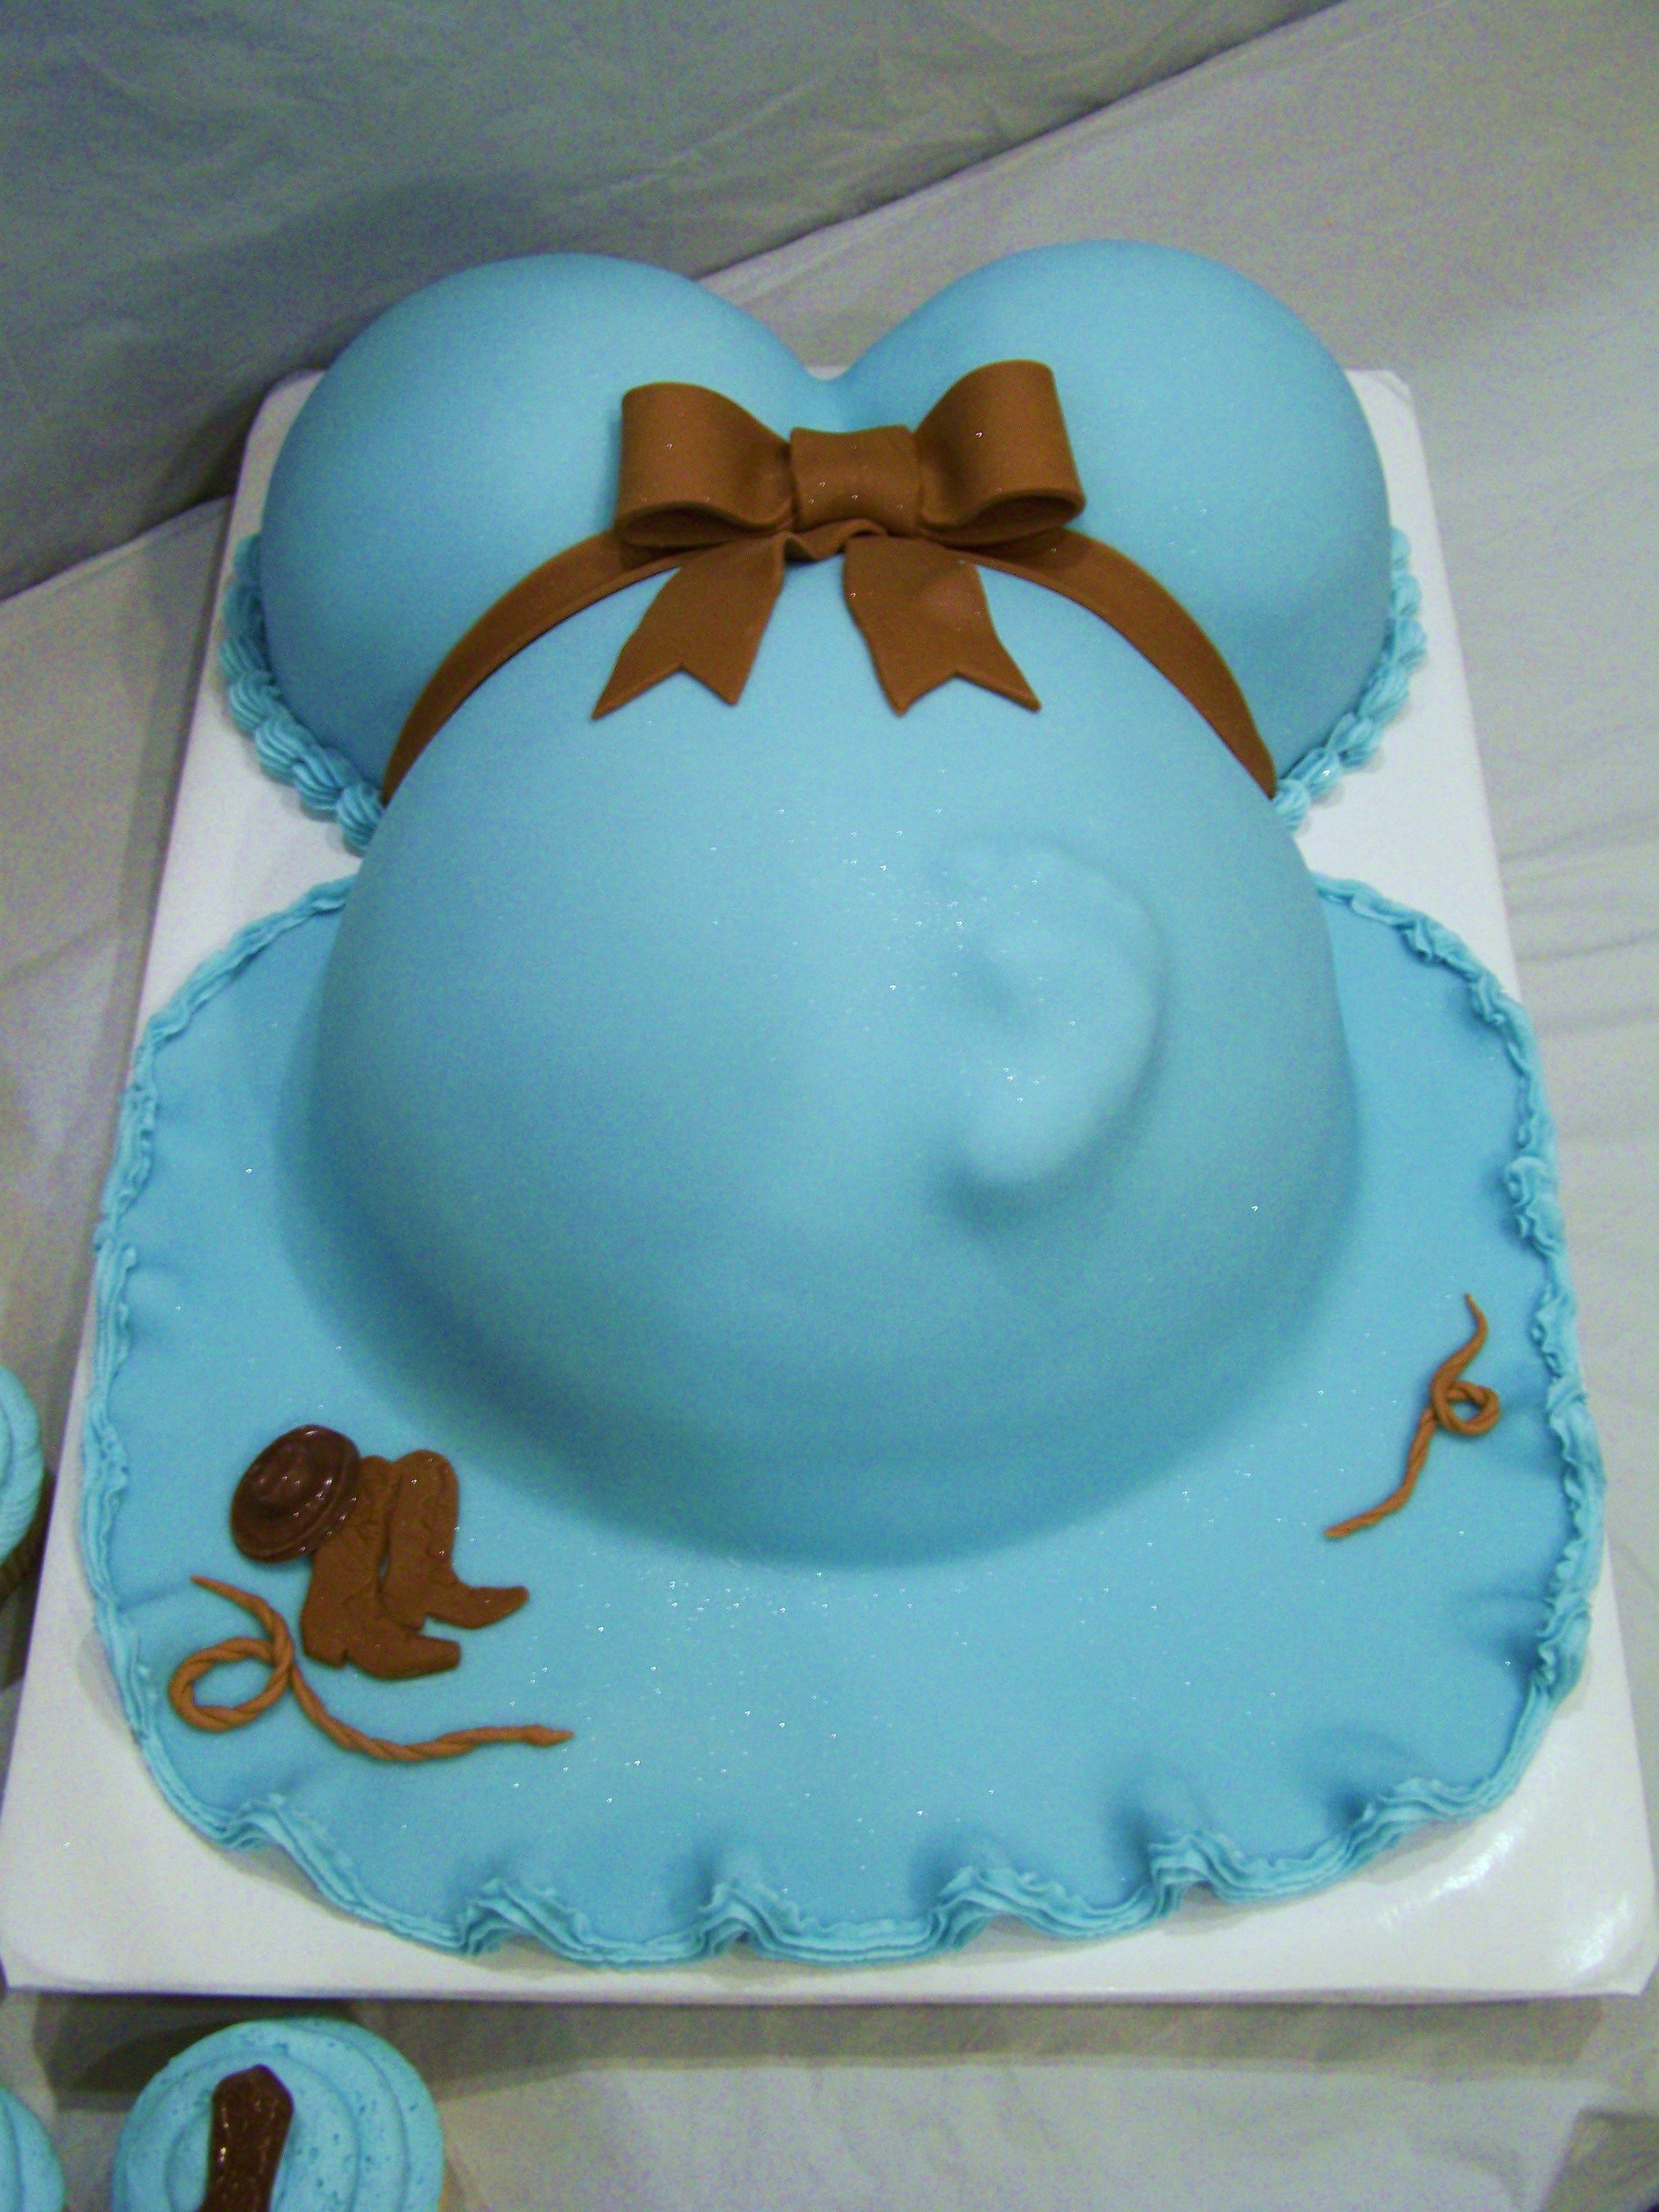 Pin Western Turquoise Cake Cake on Pinterest